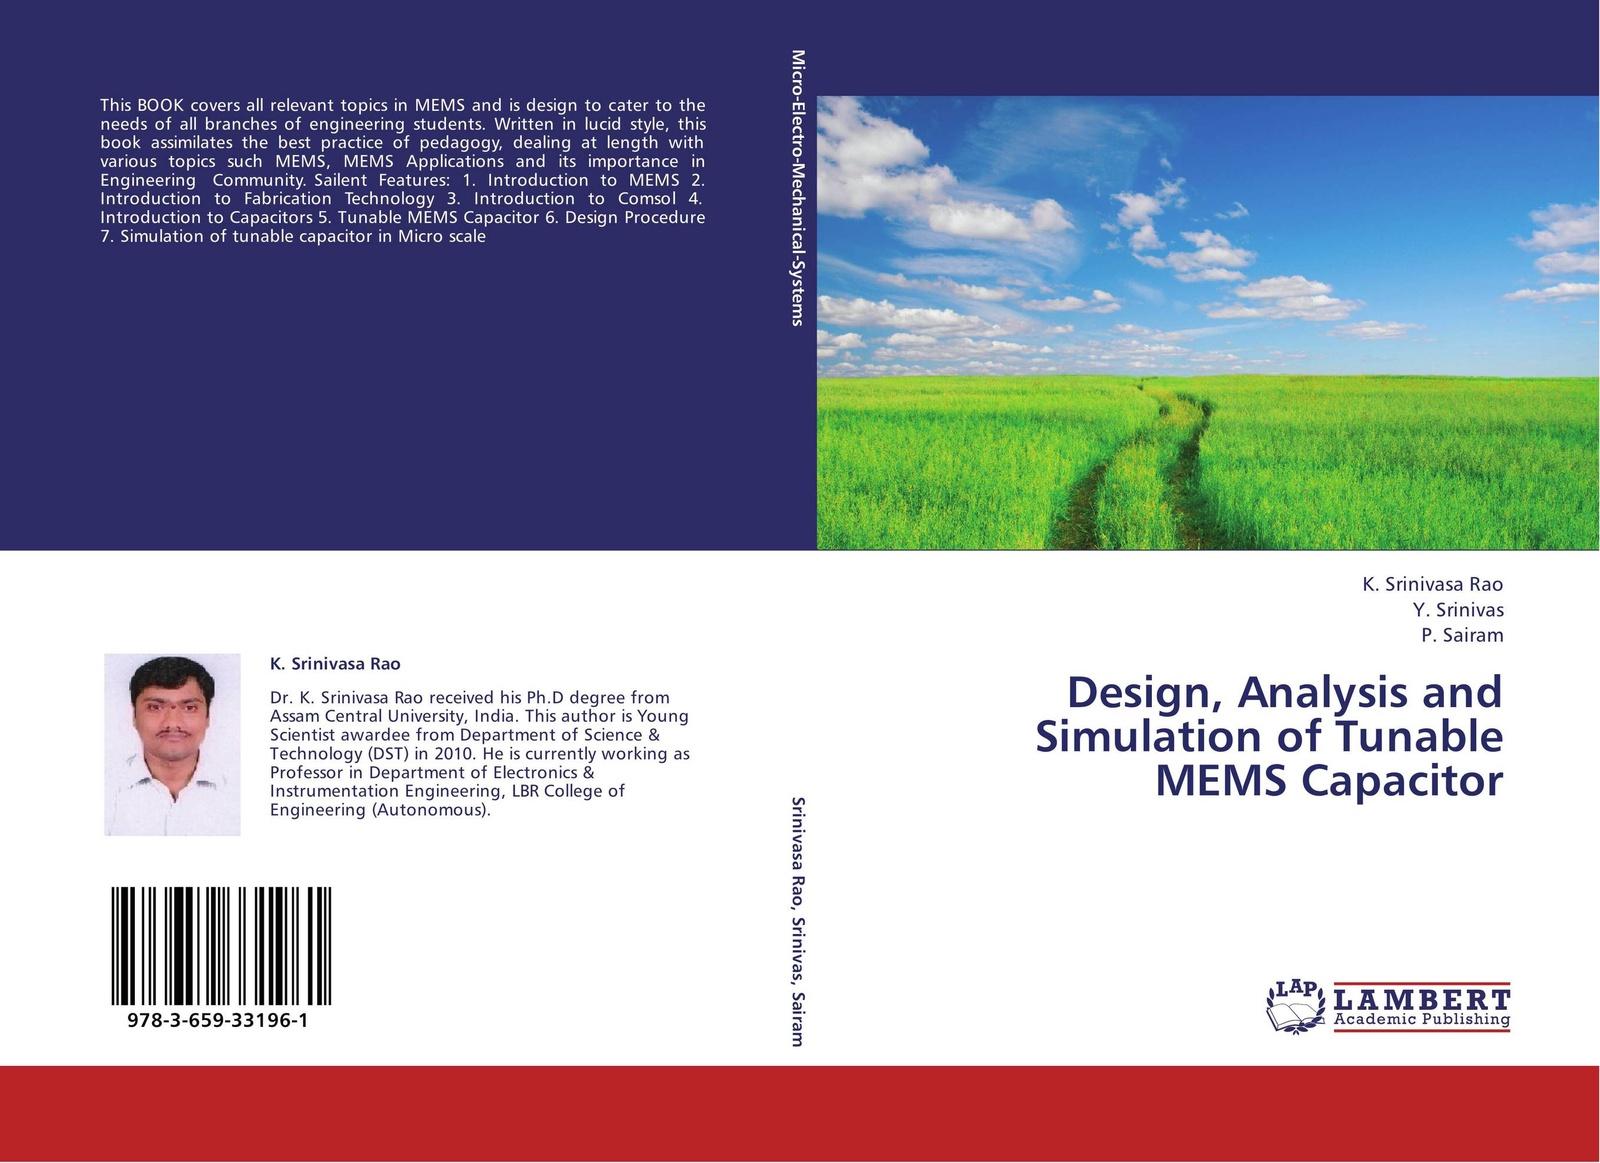 K. Srinivasa Rao,Y. Srinivas and P. Sairam Design, Analysis and Simulation of Tunable MEMS Capacitor